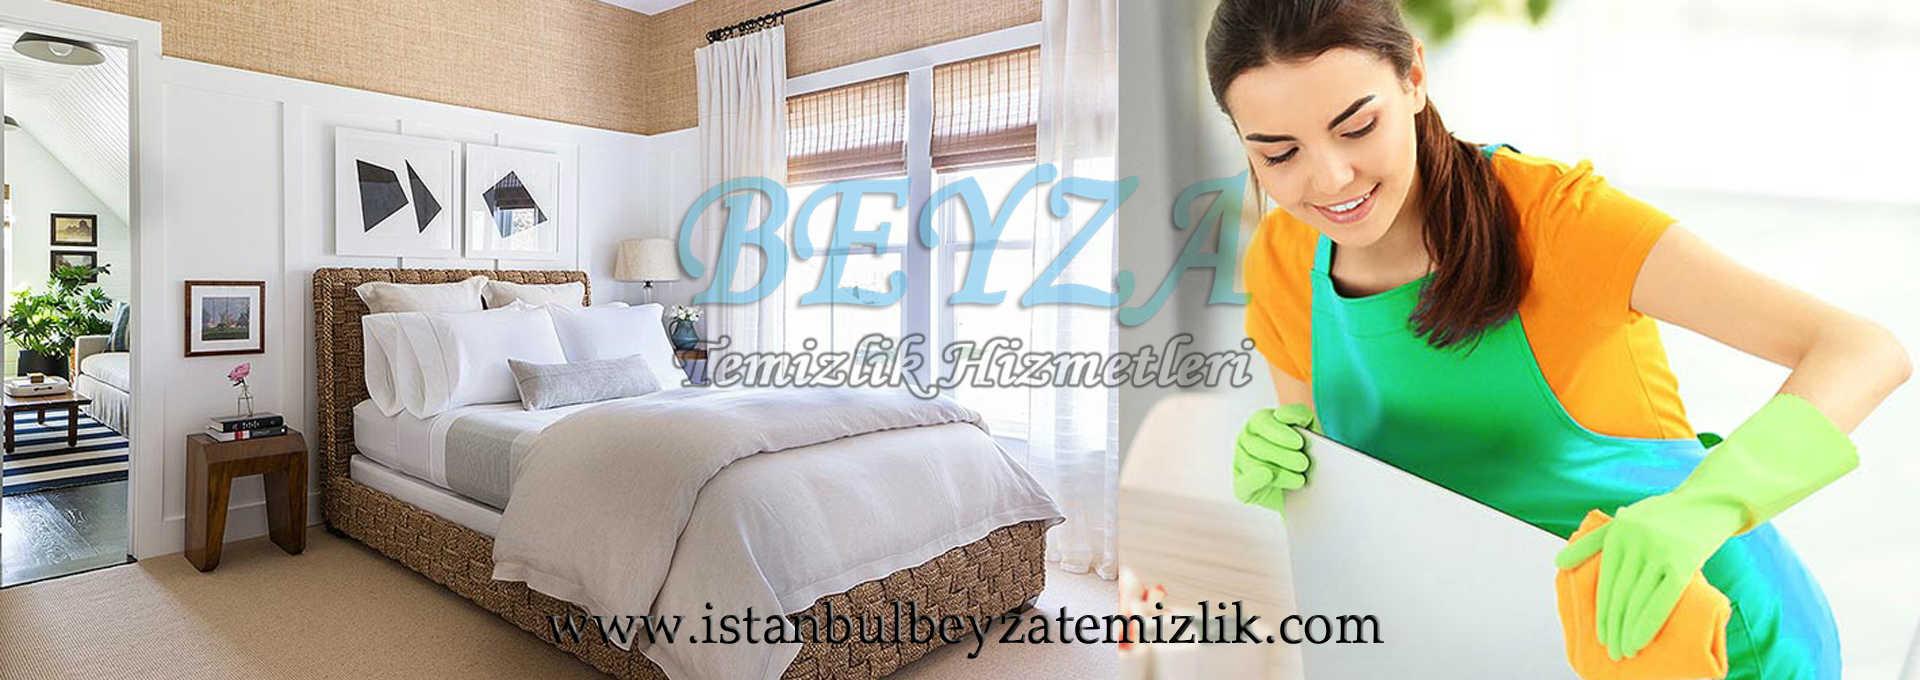 istanbul-beyza-temizlik